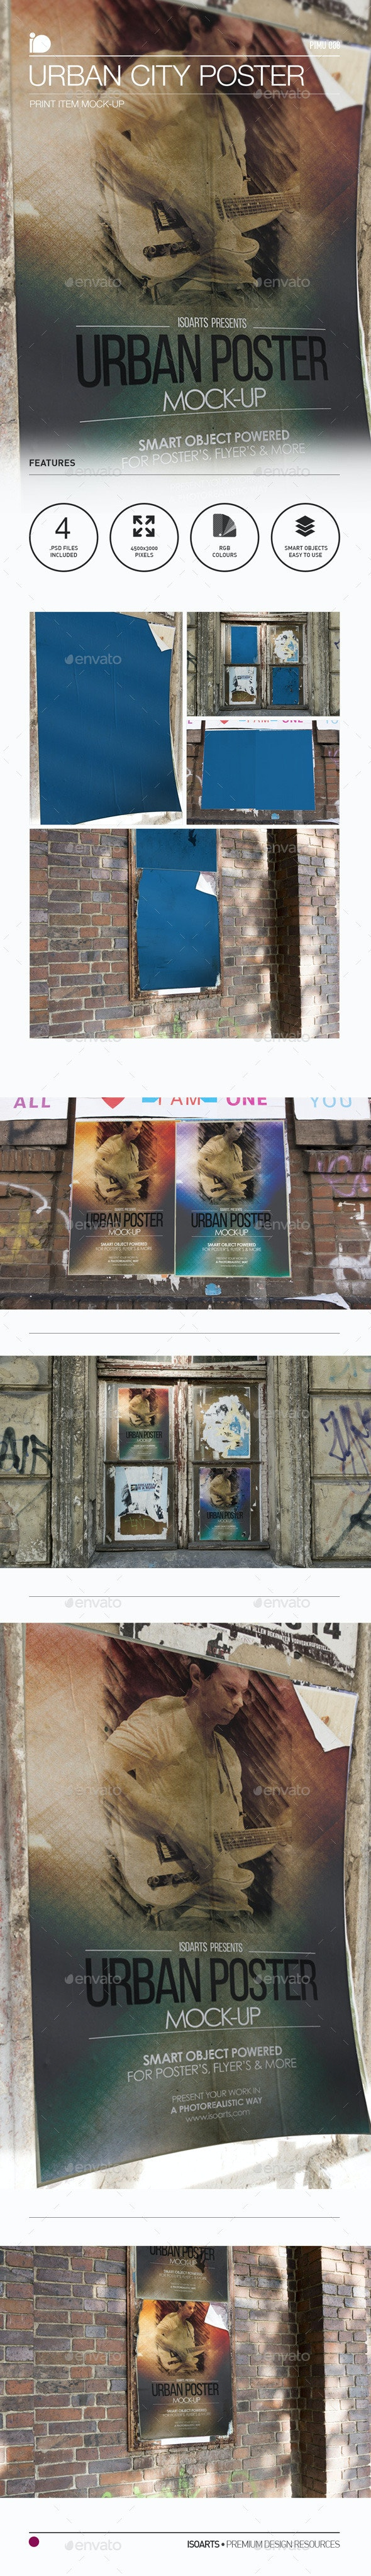 Mock-Up • Urban City Poster - Print Product Mock-Ups